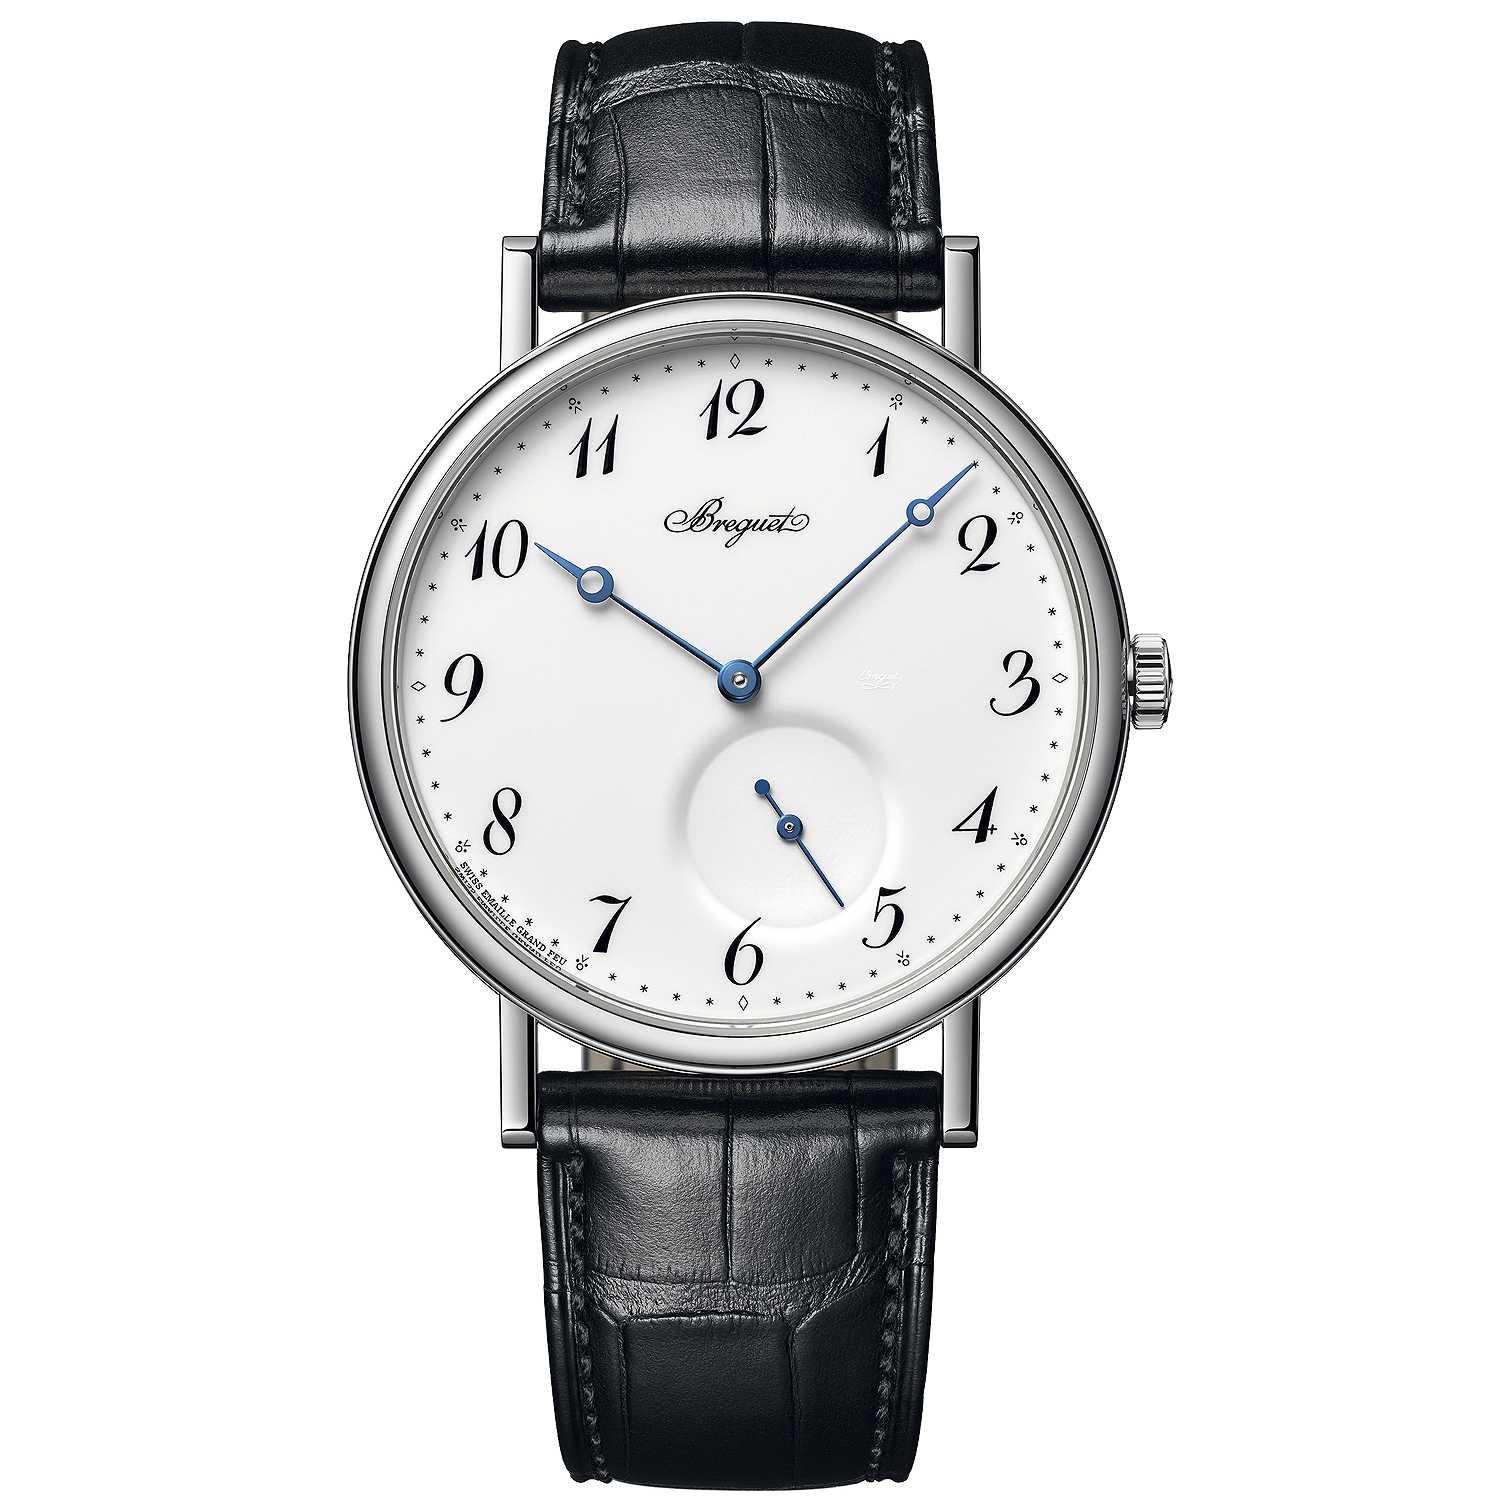 Breguet Classique Automatic Grand Feu Dial Watch